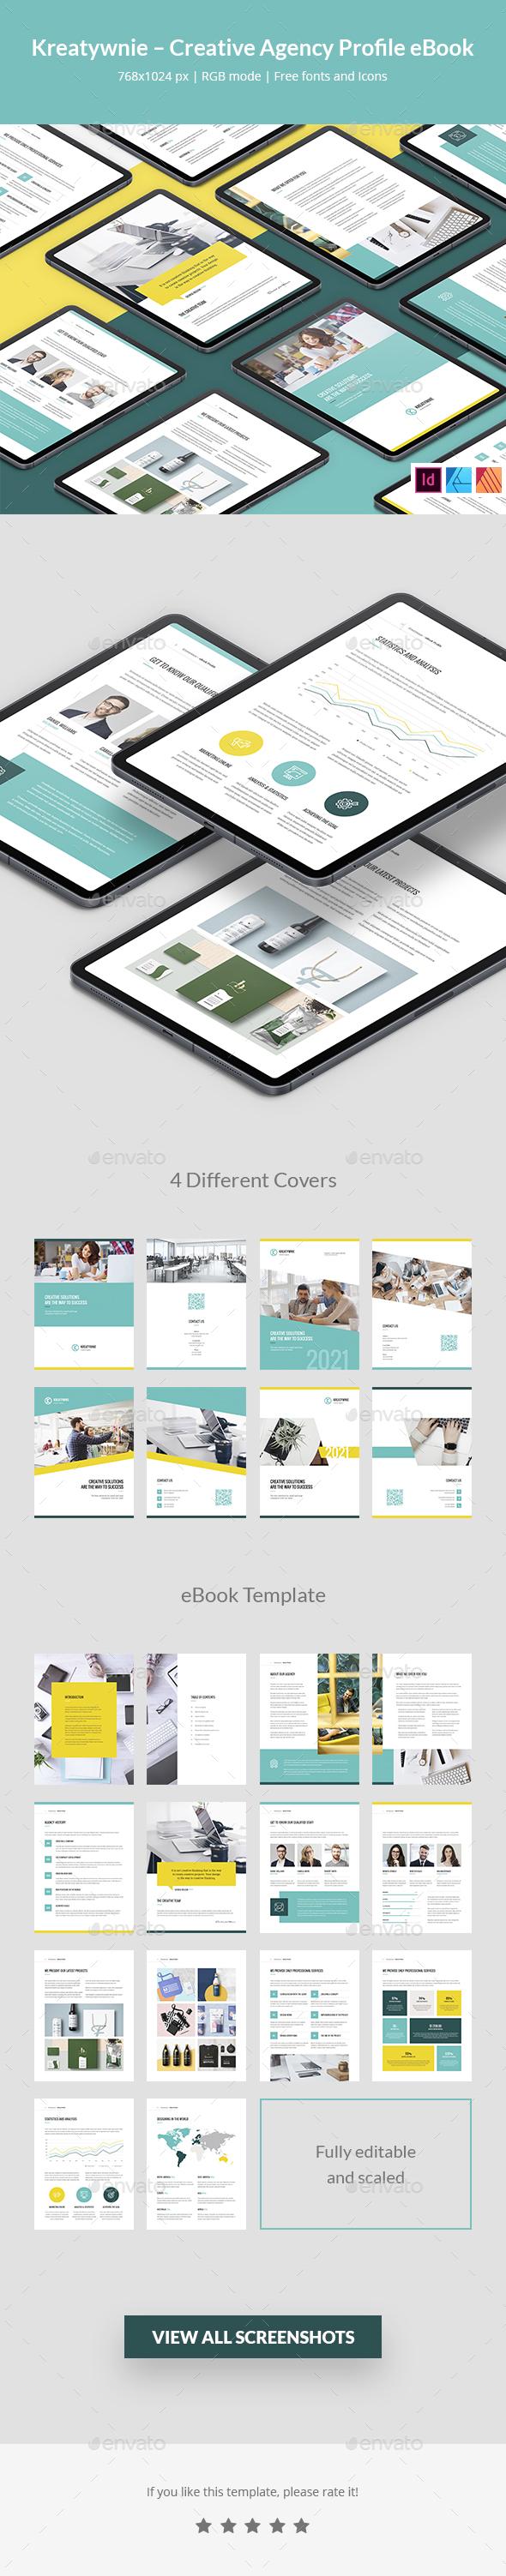 Kreatywnie – Creative Agency Profile eBook